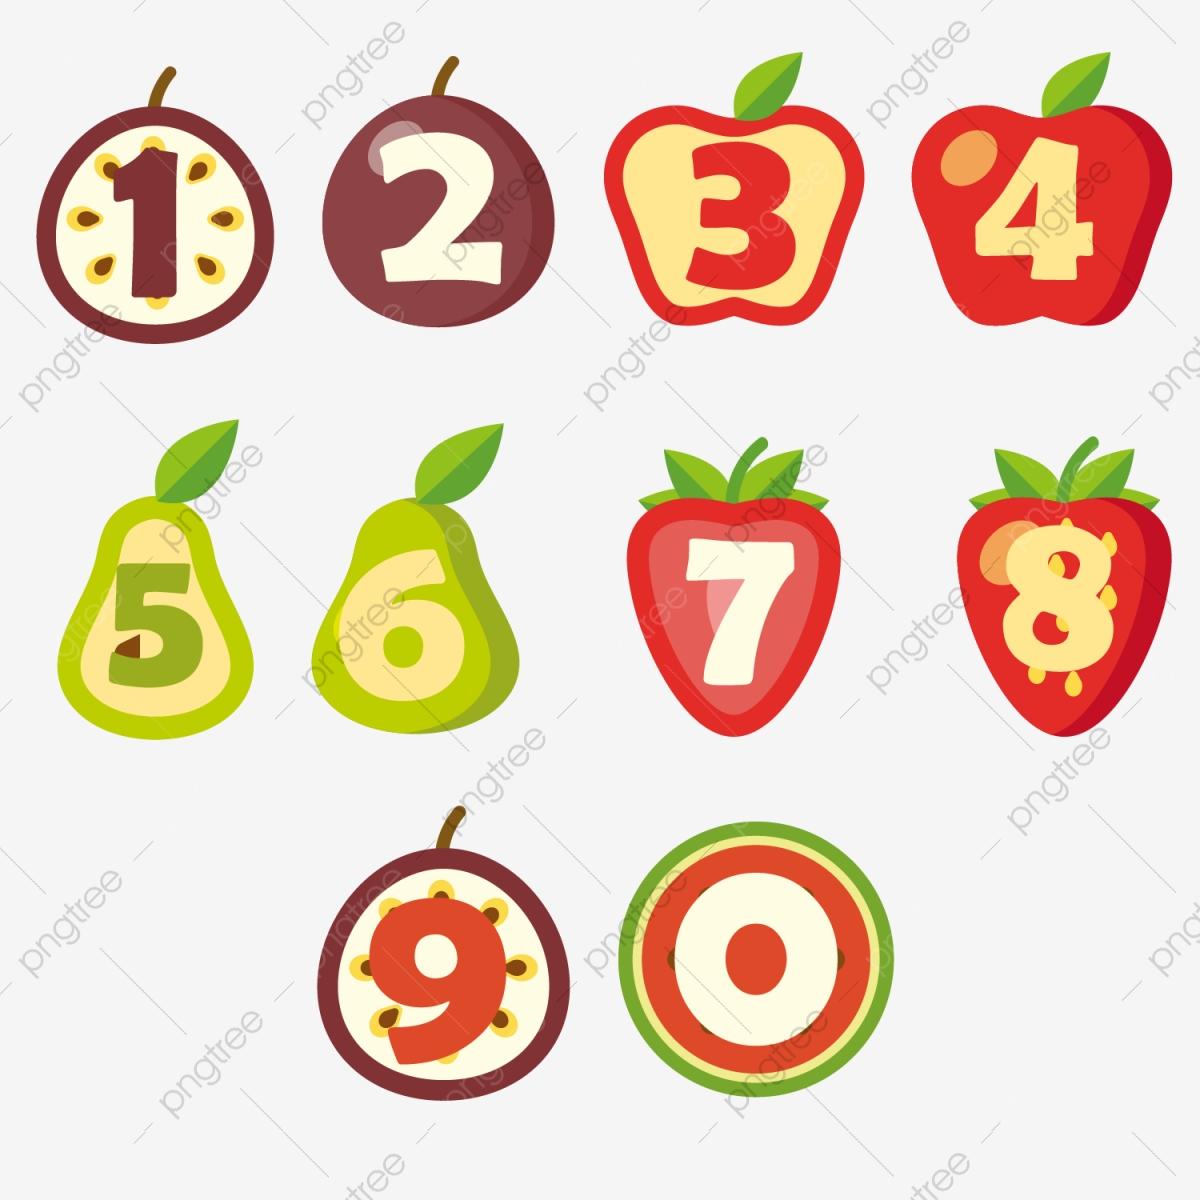 Creative Fruit Digital Art Word Fruit 1 2, 3, Arabic Numerals.